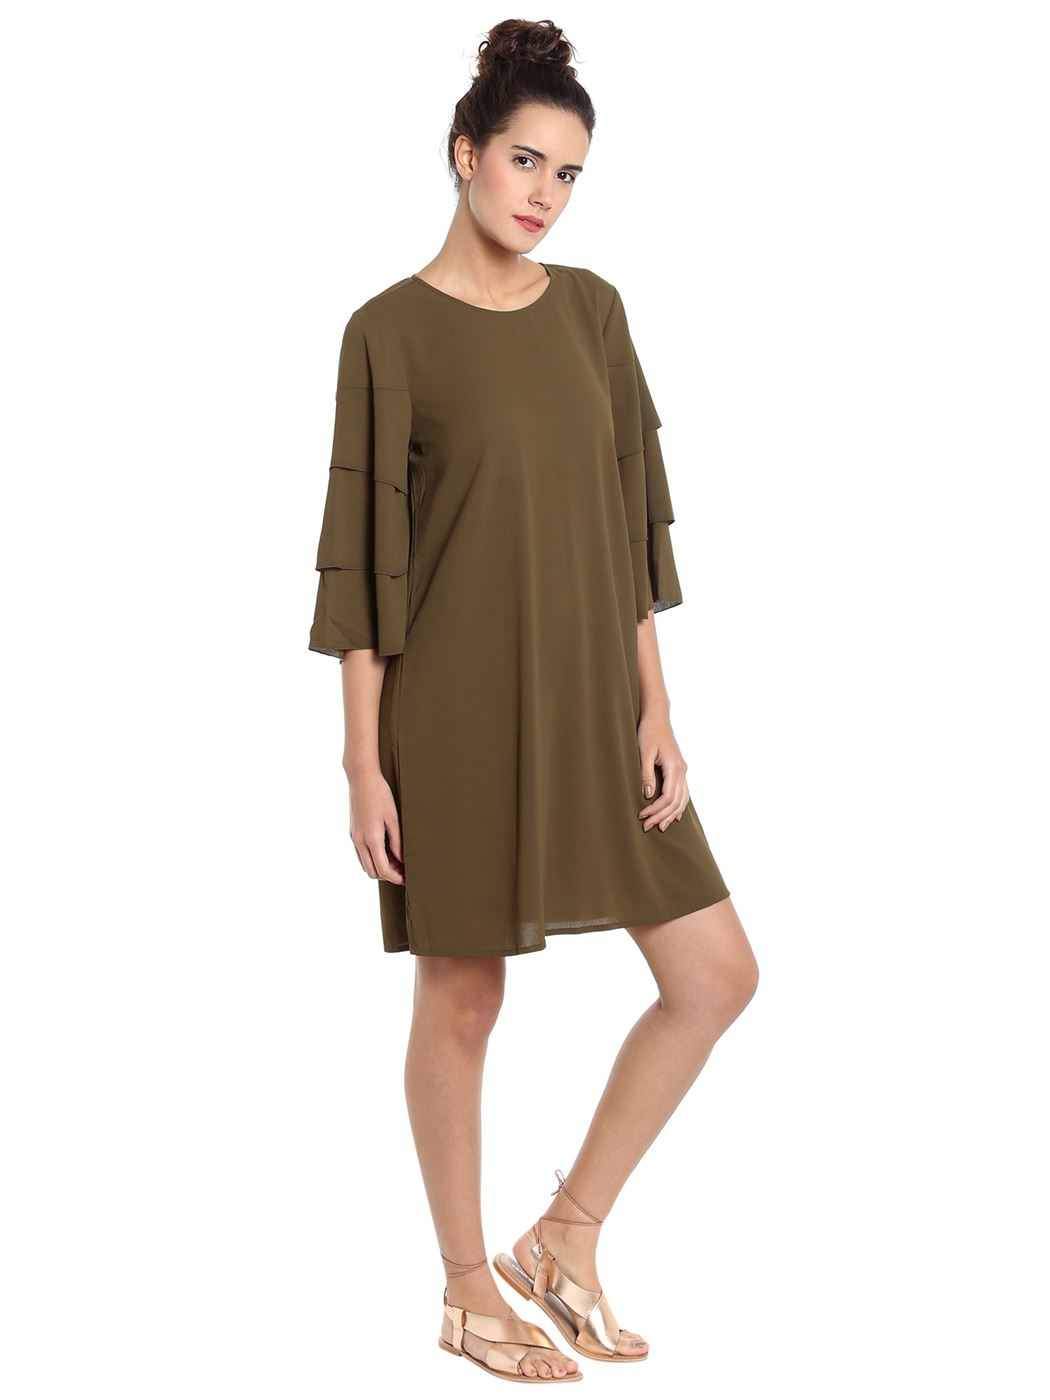 Vero Moda Women's 3/4th Sleeve Green Dress